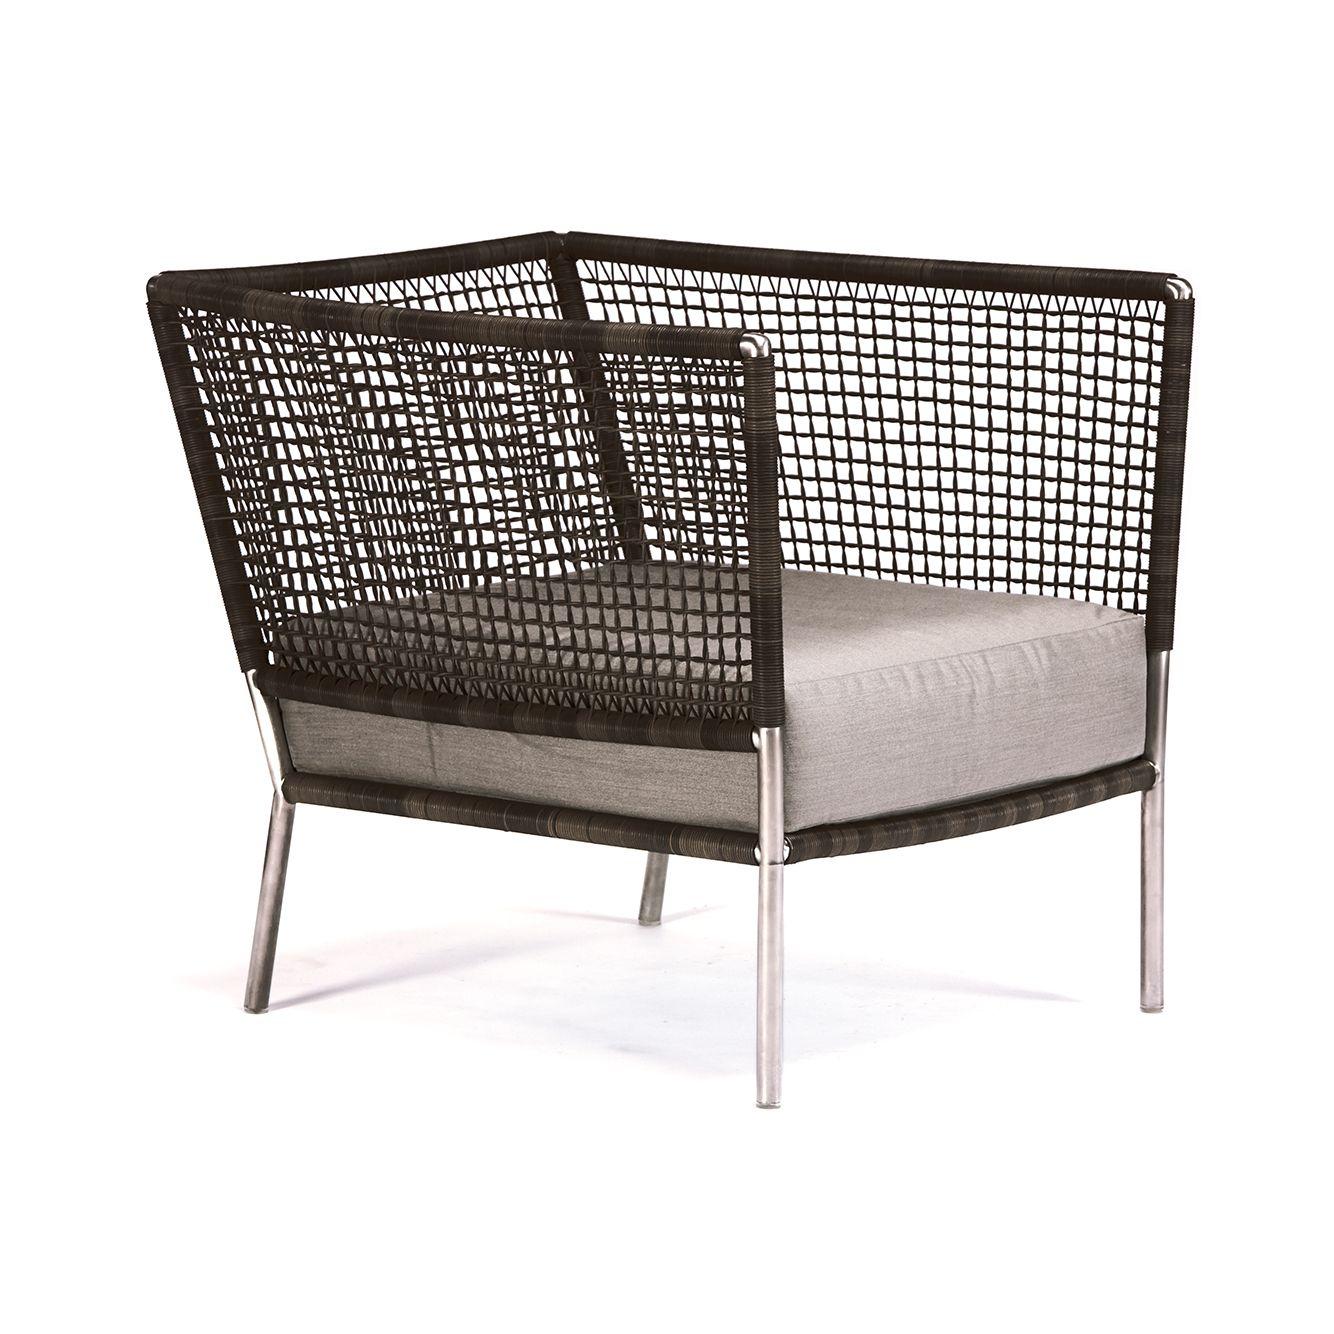 Patio Pool  Deck Lounge Chairs  Jardin de Ville